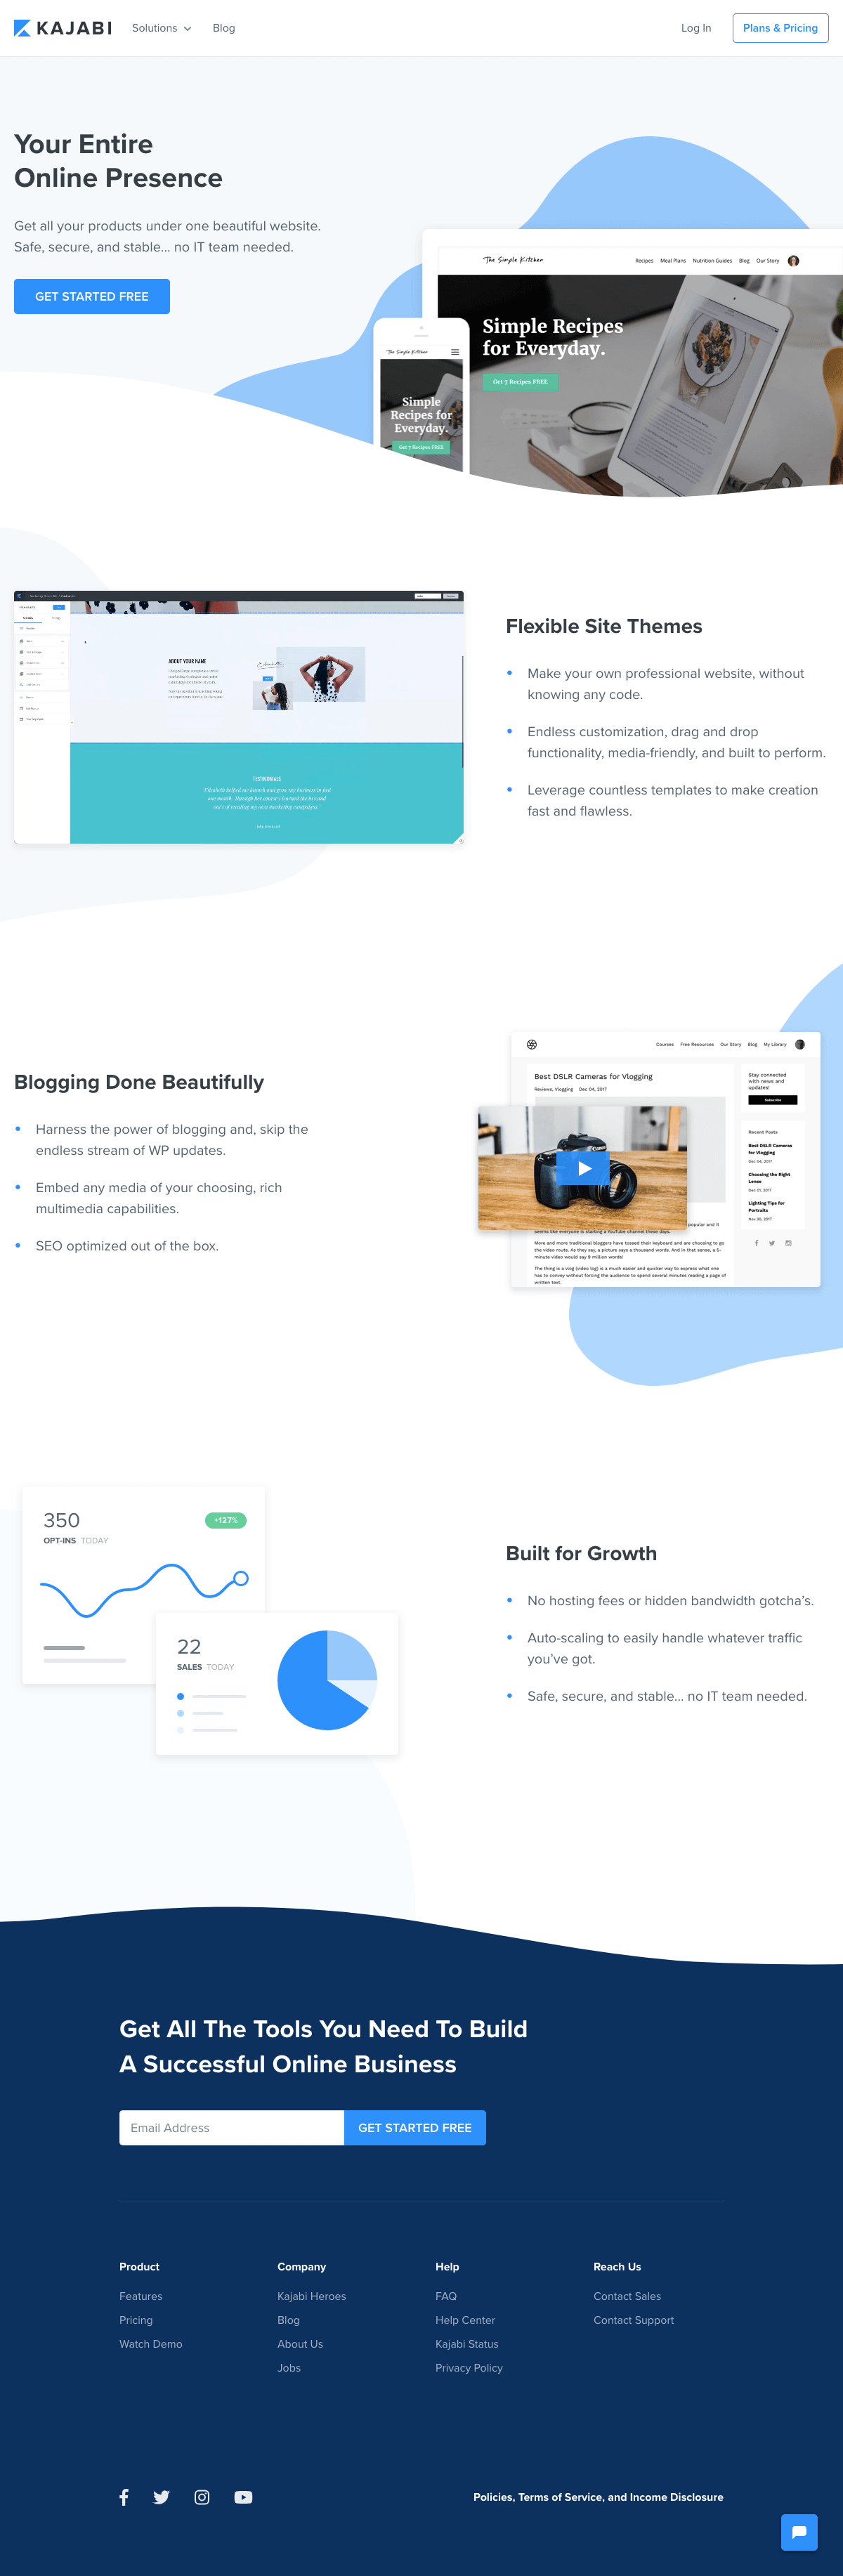 Kajabi - Features page 2